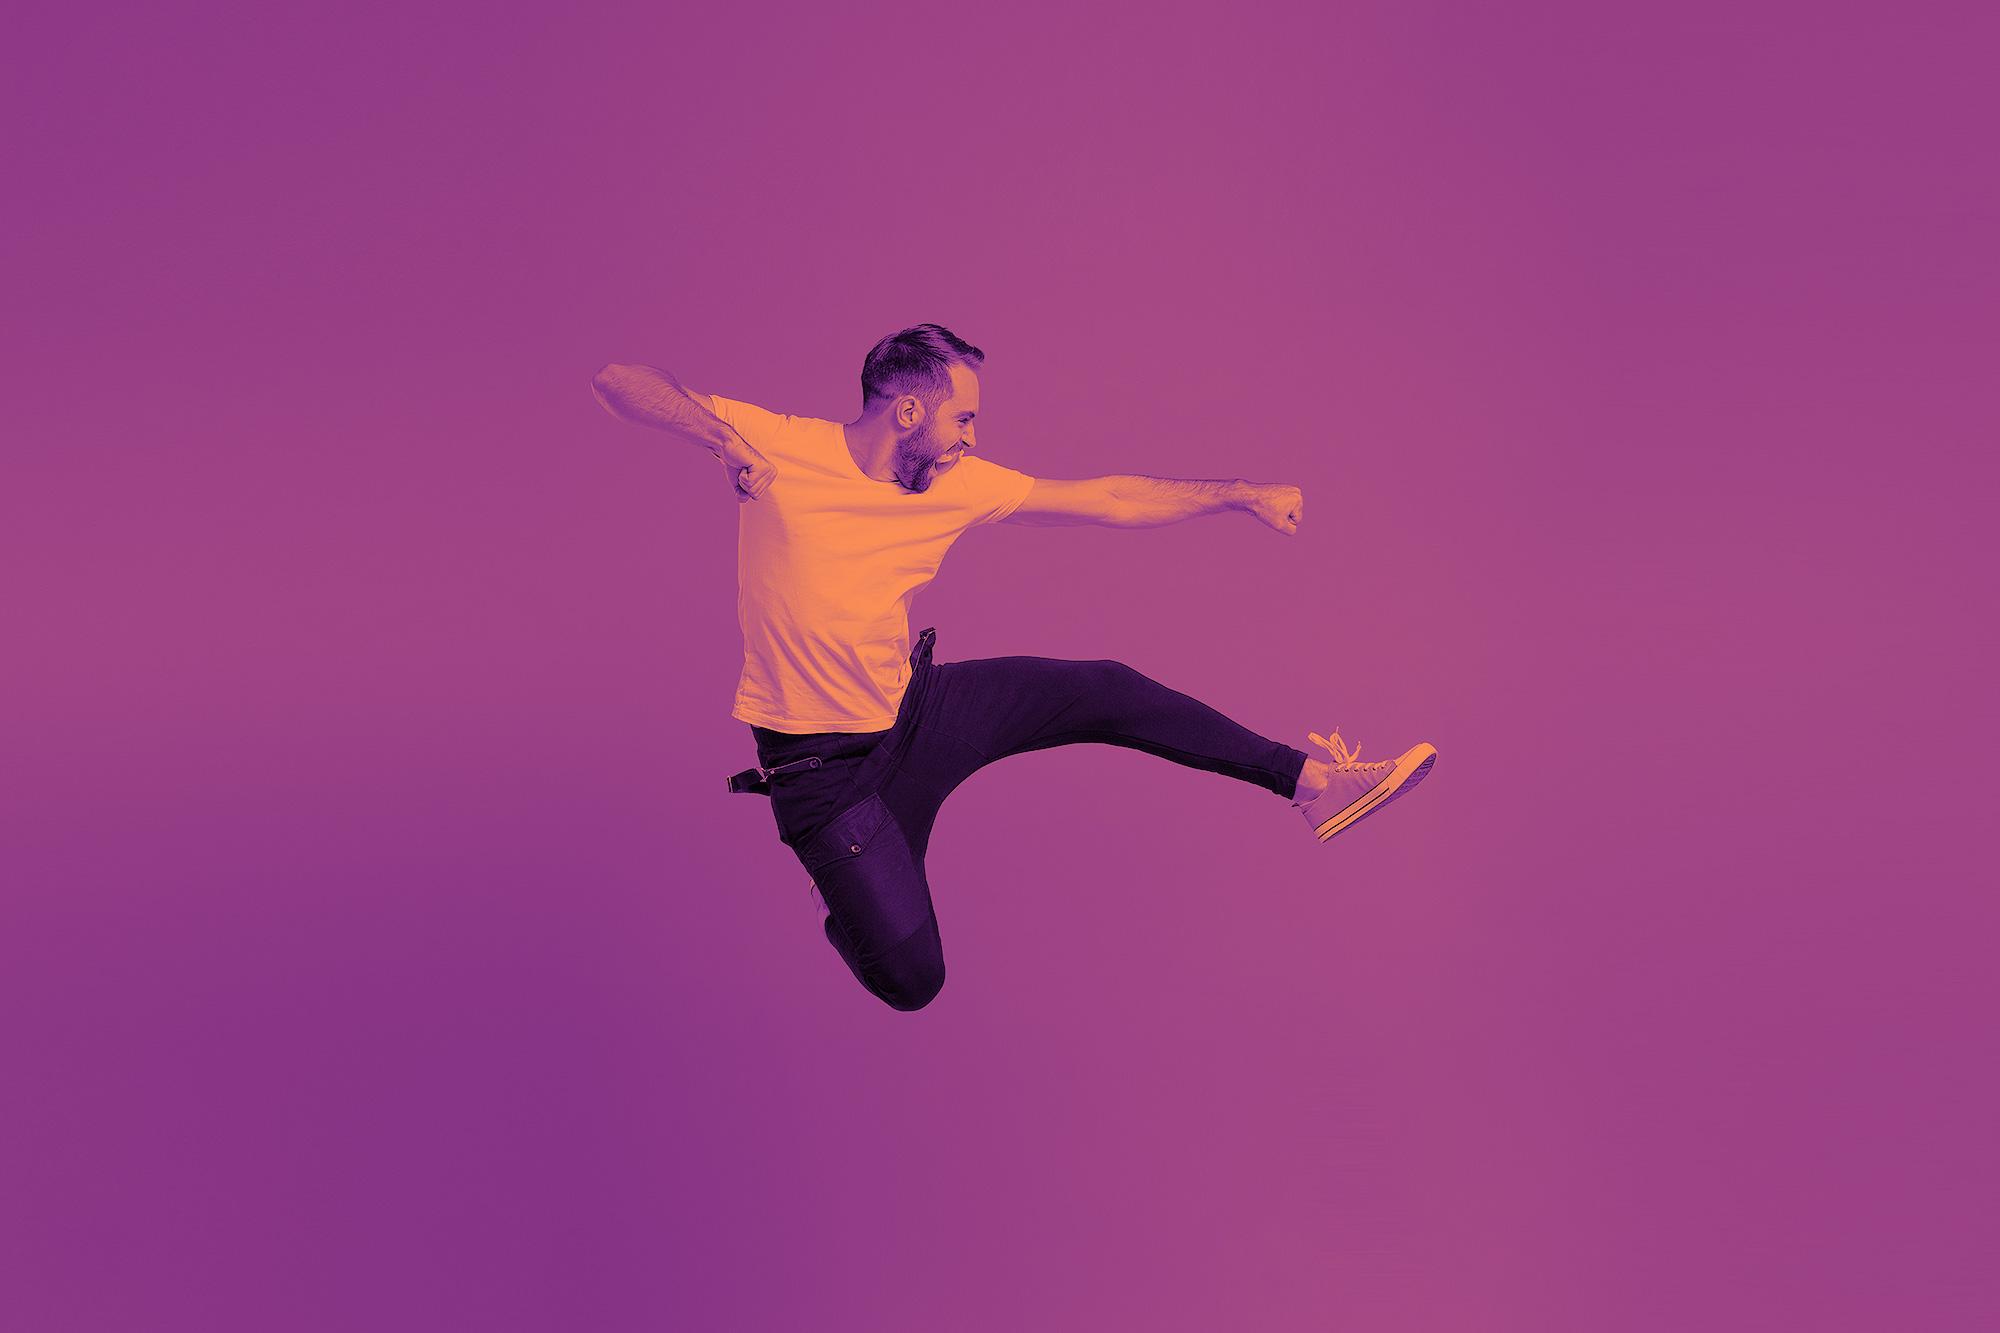 boostez communication image jump